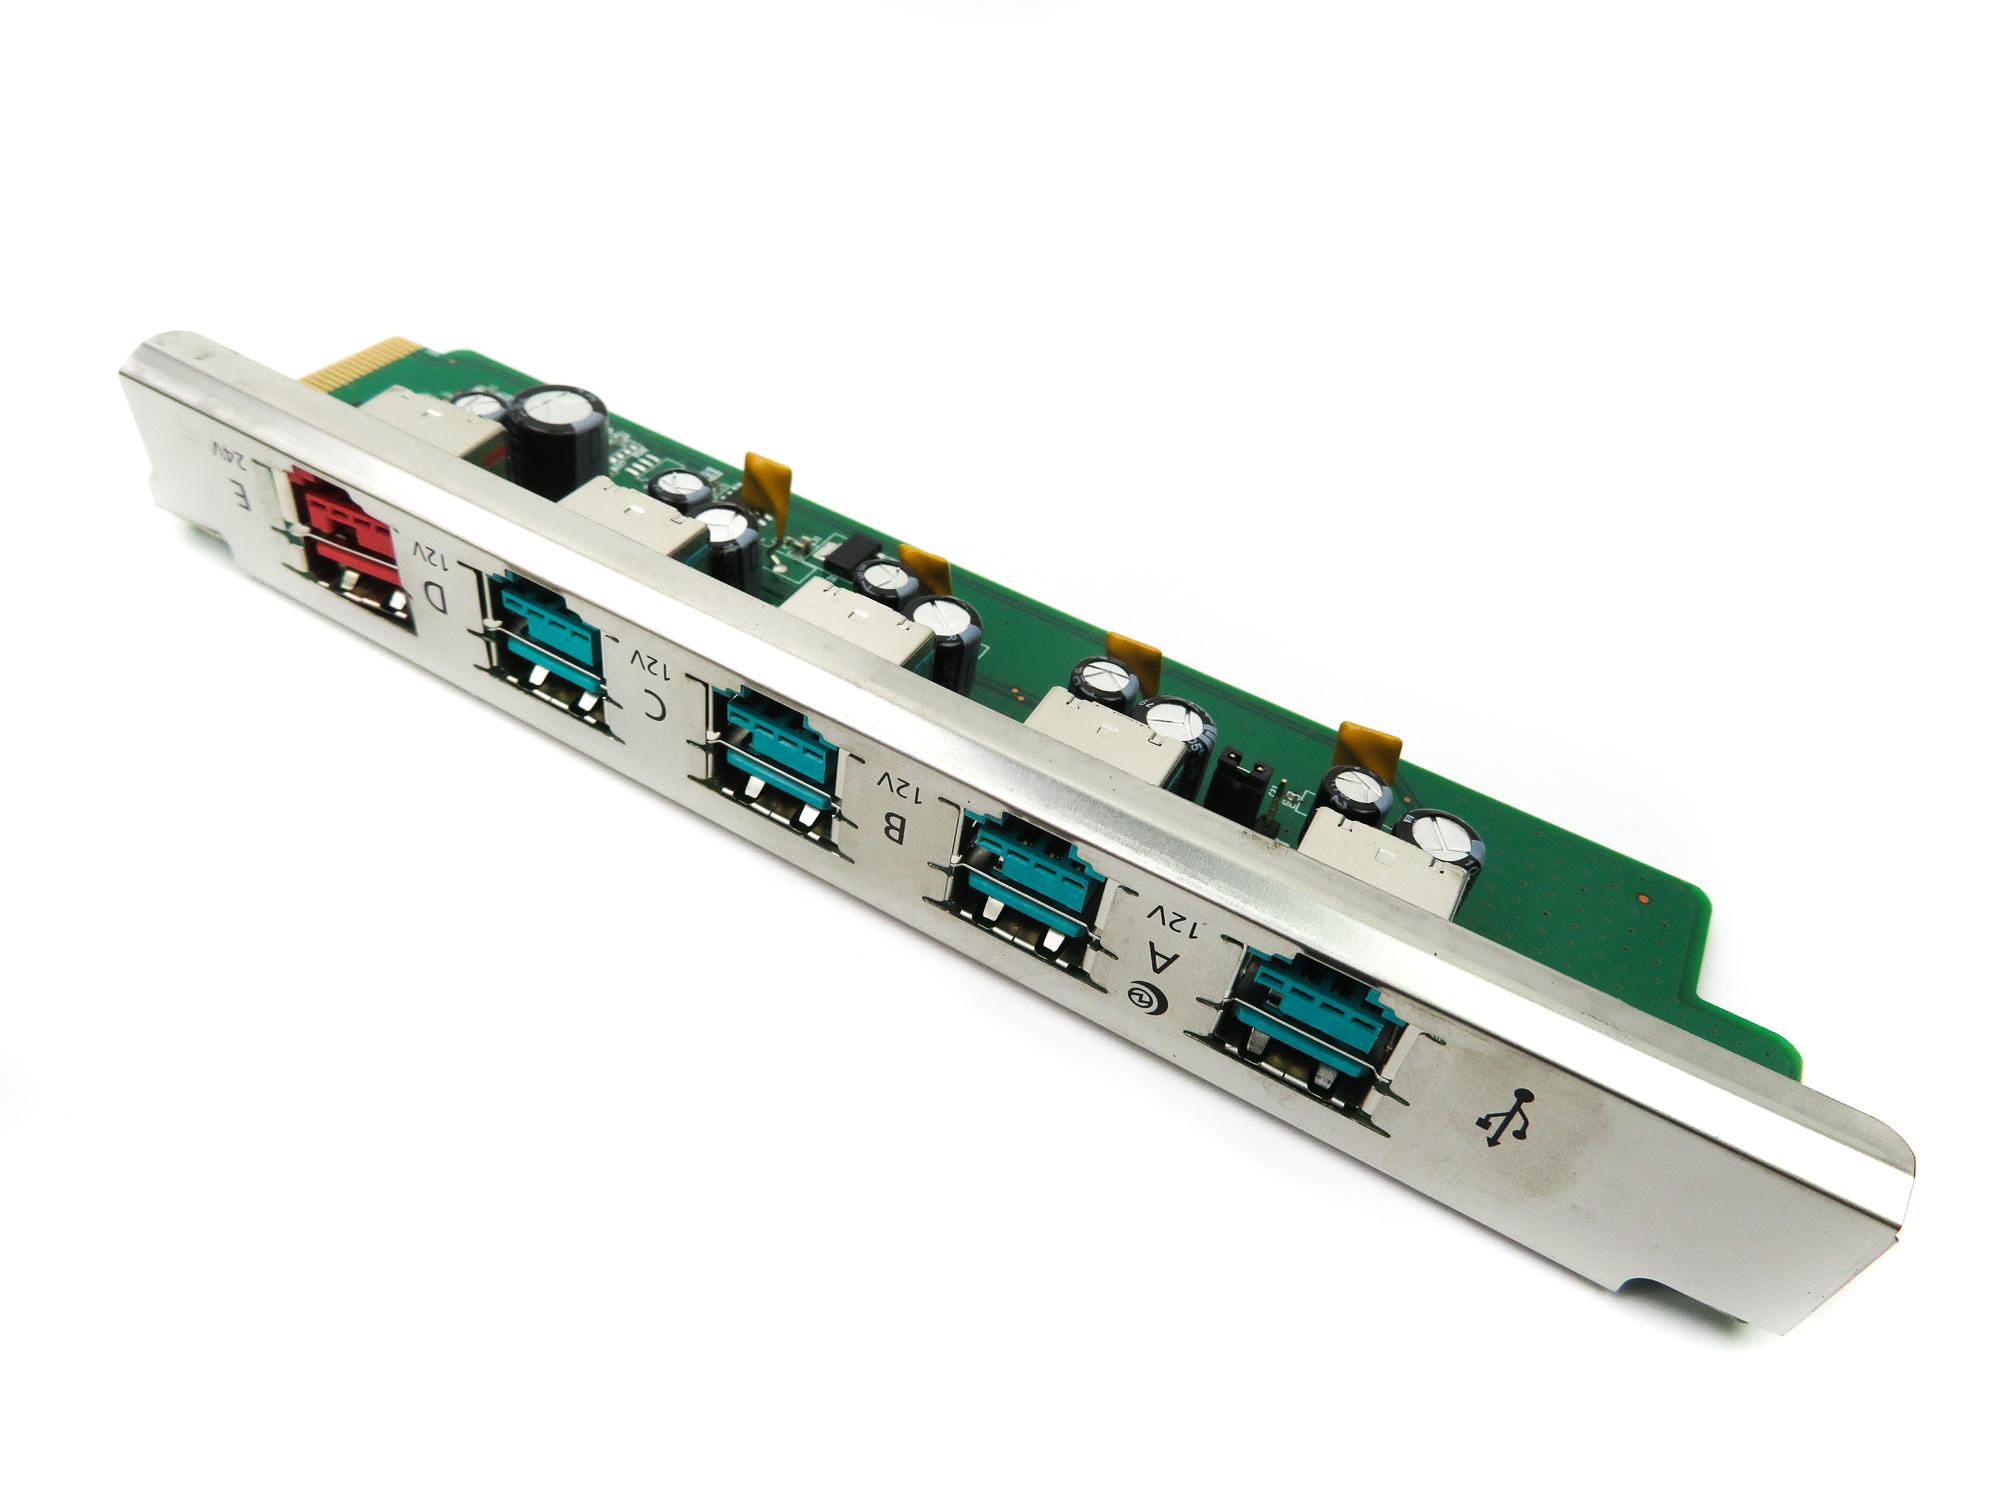 Toshiba 3AC00502400 Jaspar_USB_IO_Board /f TCx?300 - 4810-370 ePOS